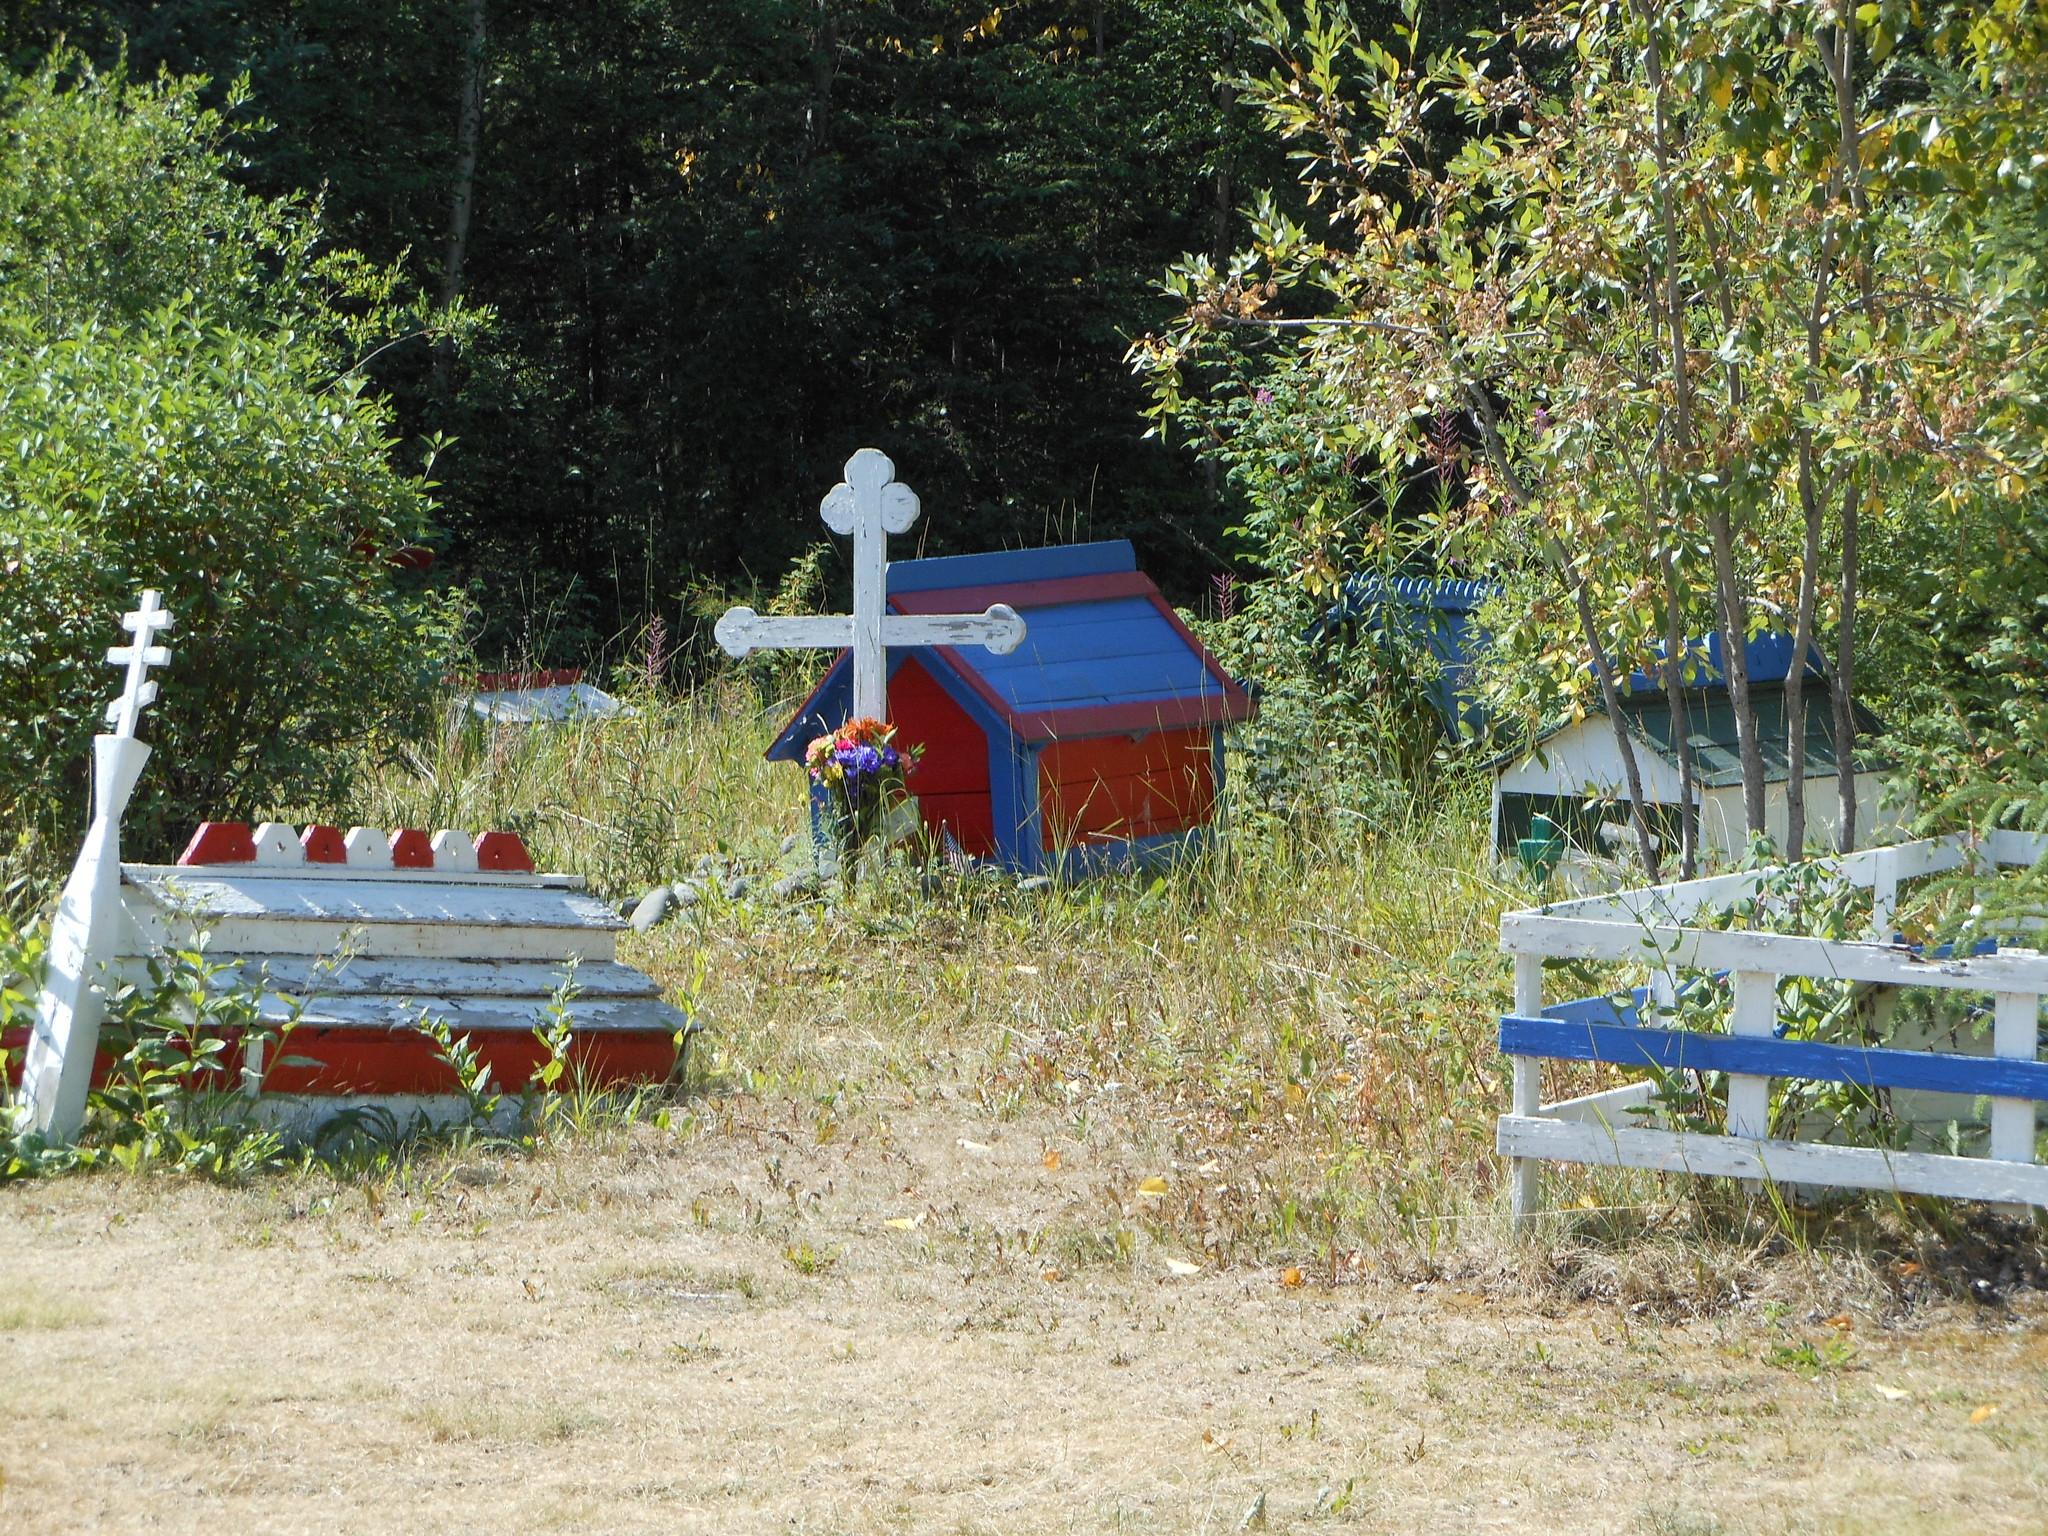 St. Nicholas, Eklutna